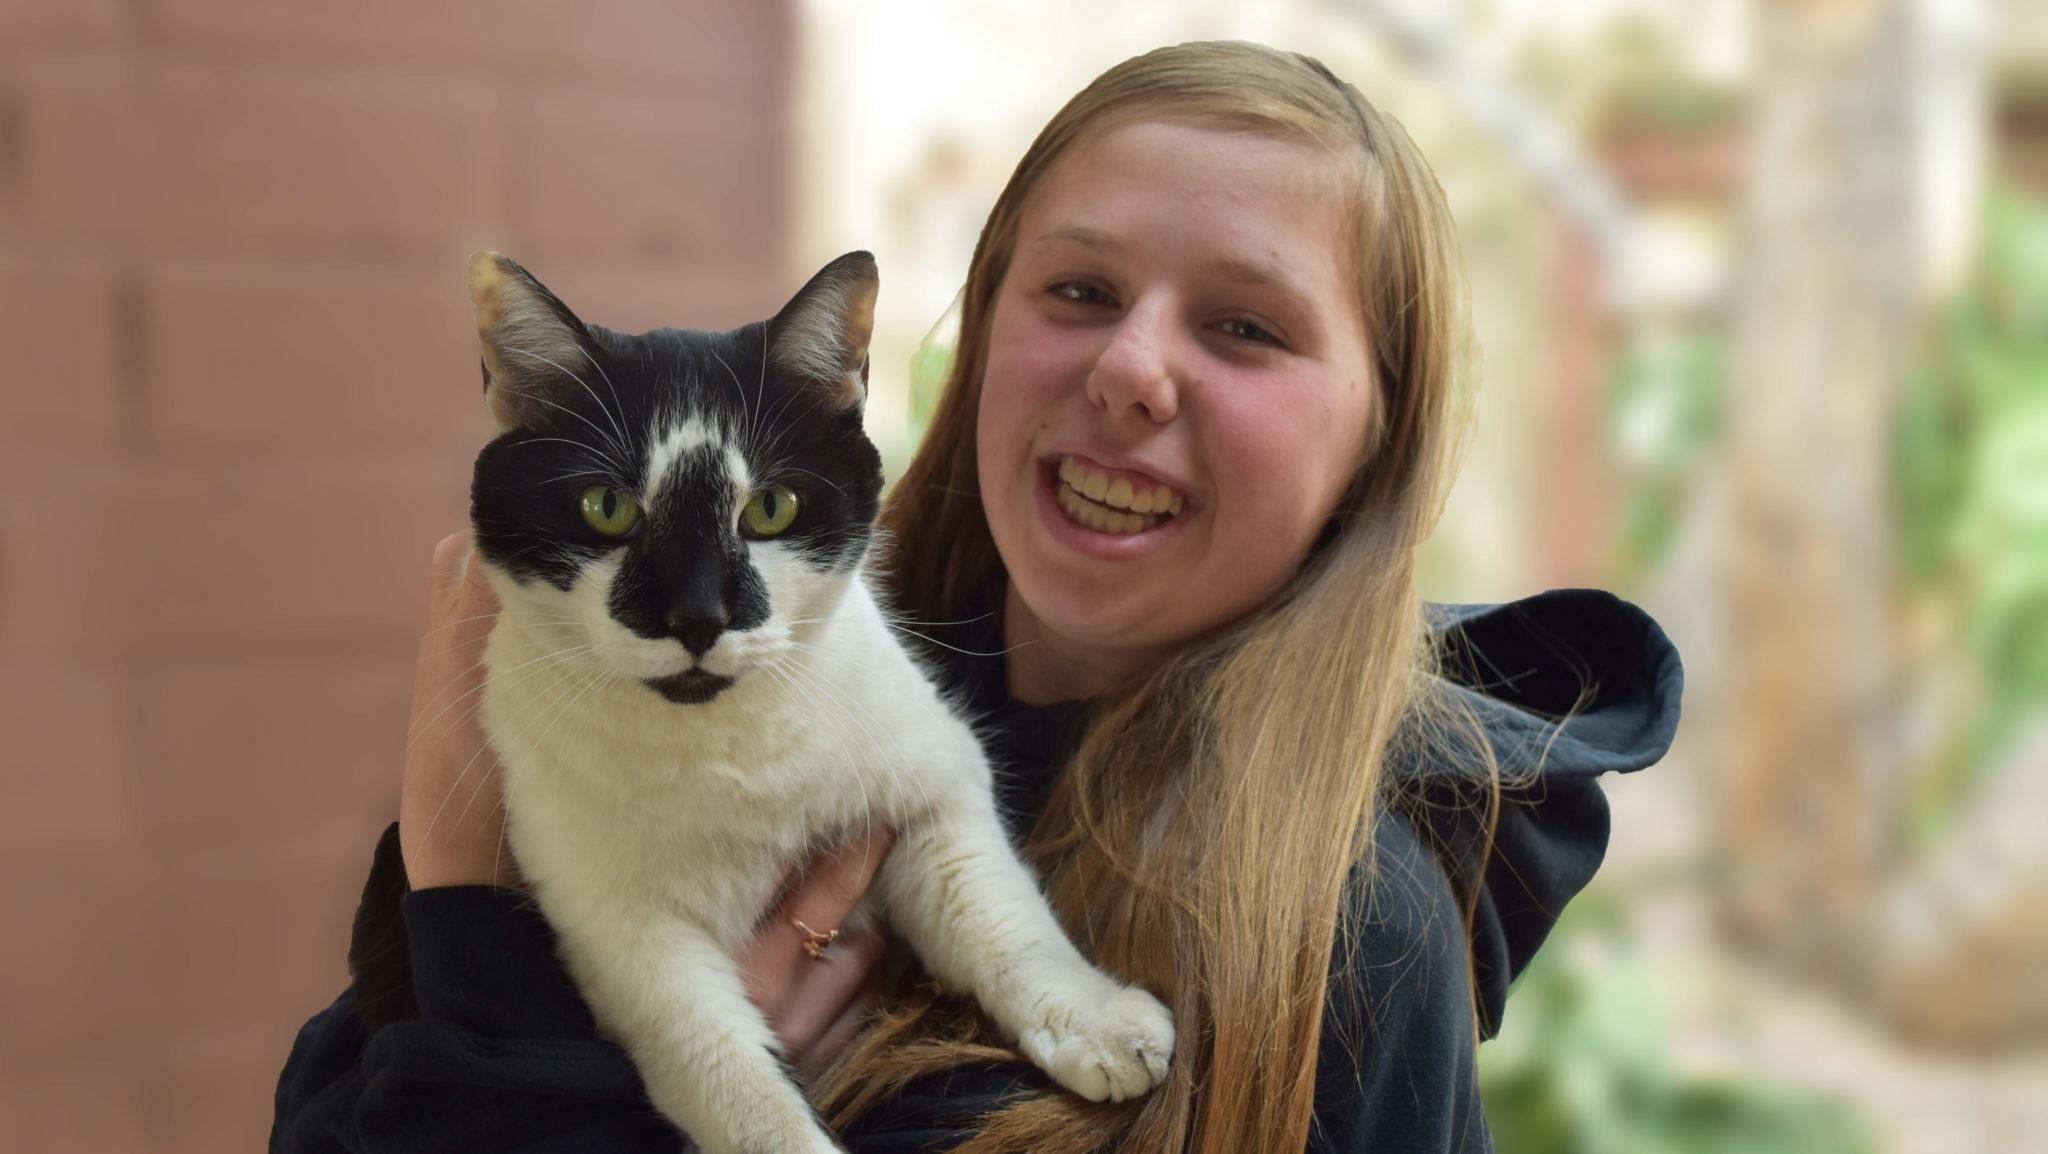 Teenage girl holding the House cat Smokey